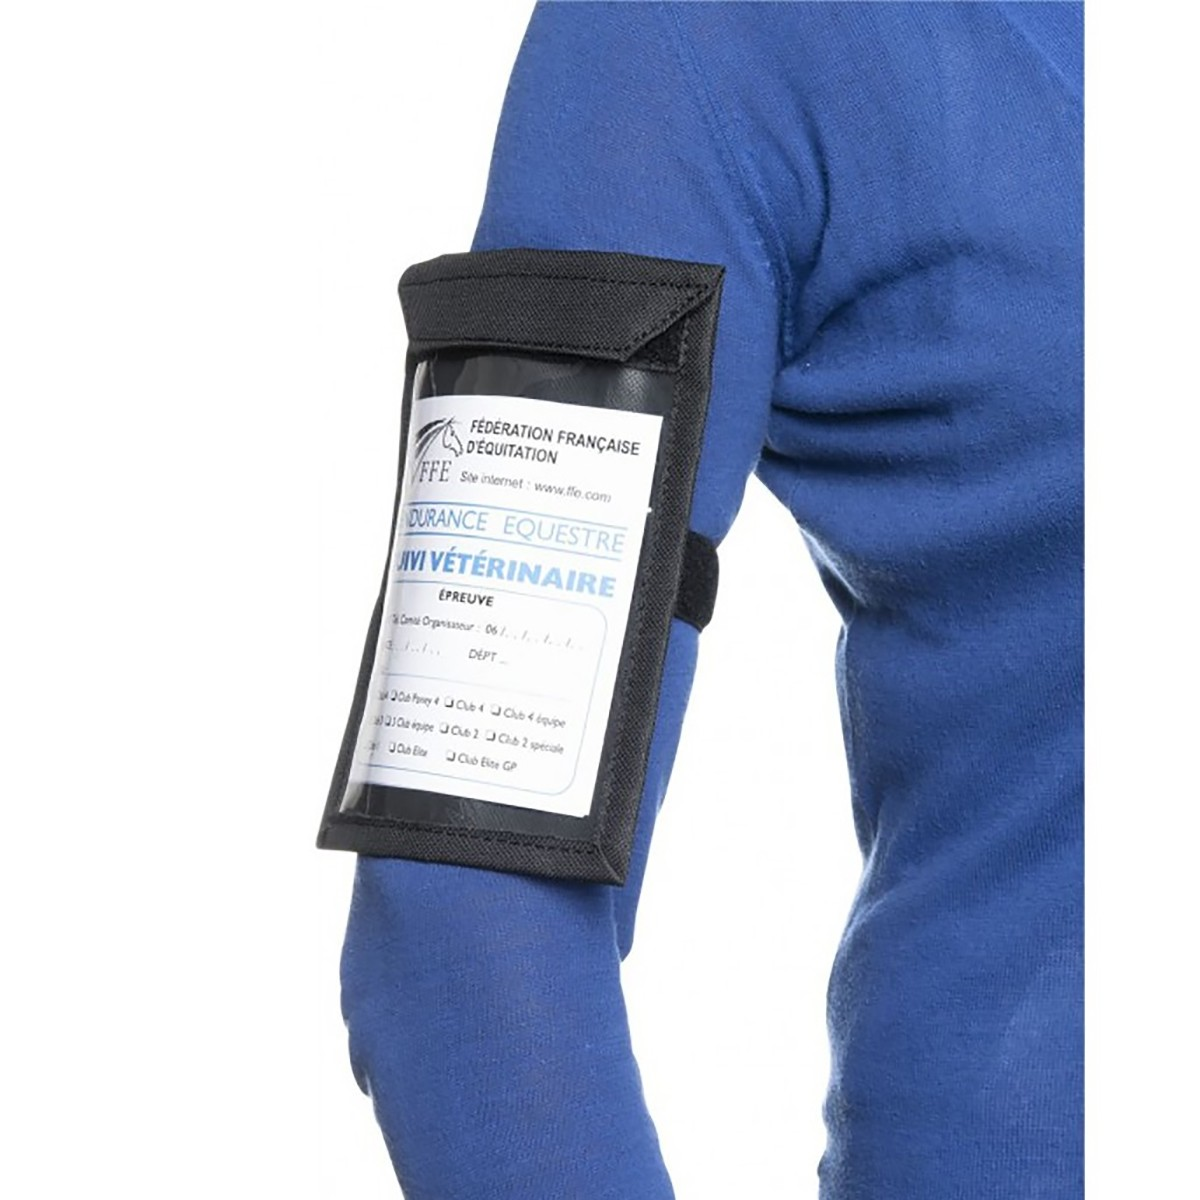 Medical Card Holder Armband